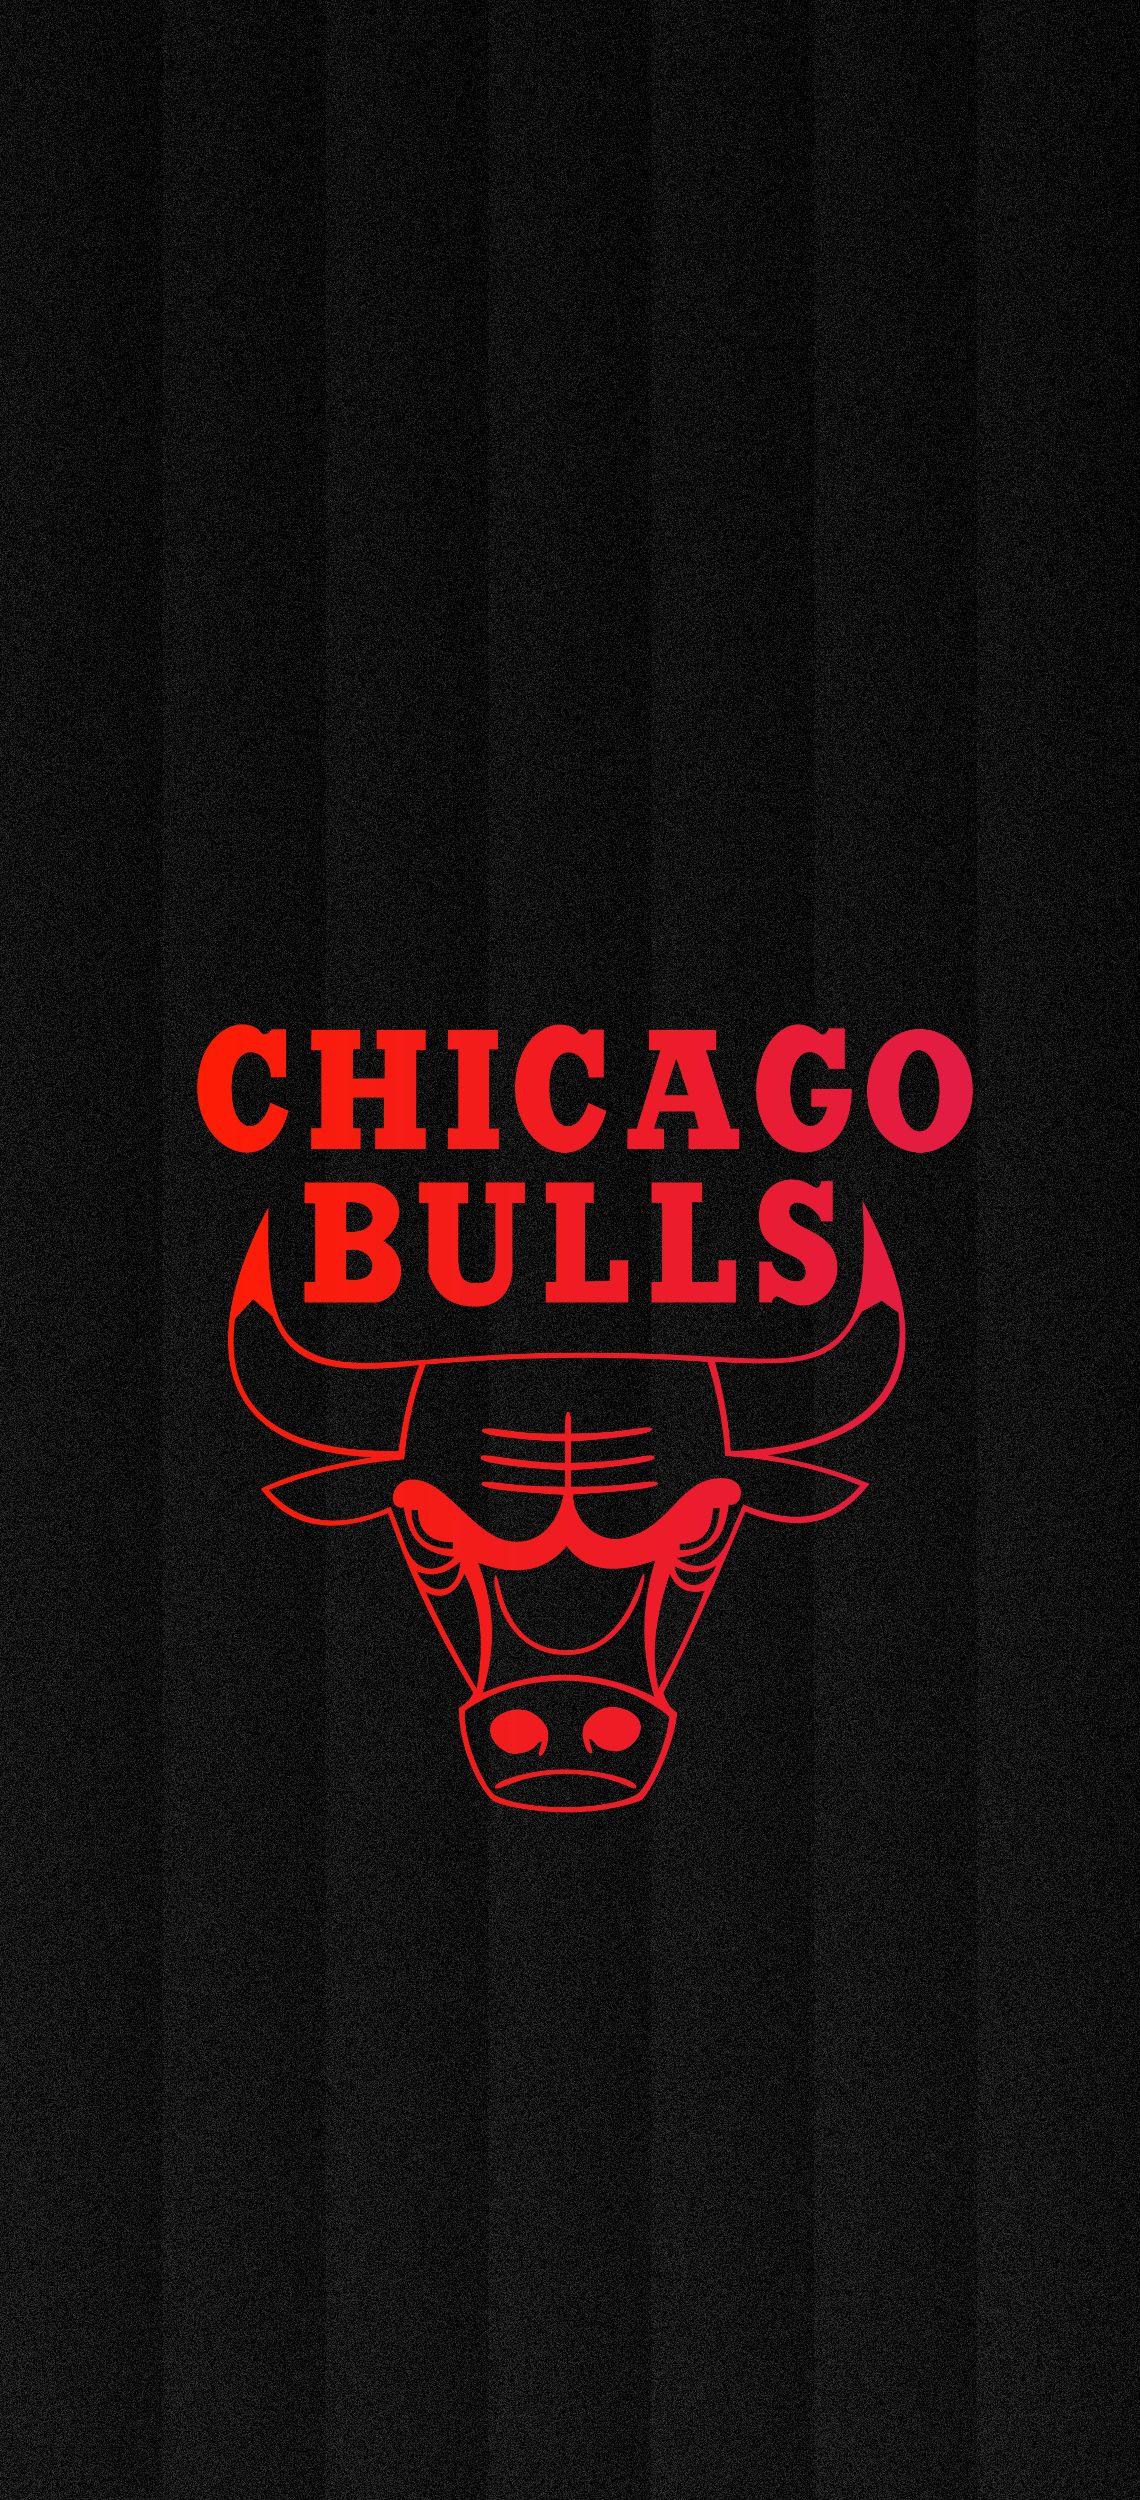 Sportsign Shop Redbubble Chicago Bulls Chicago Bulls Wallpaper Chicago Bulls Logo